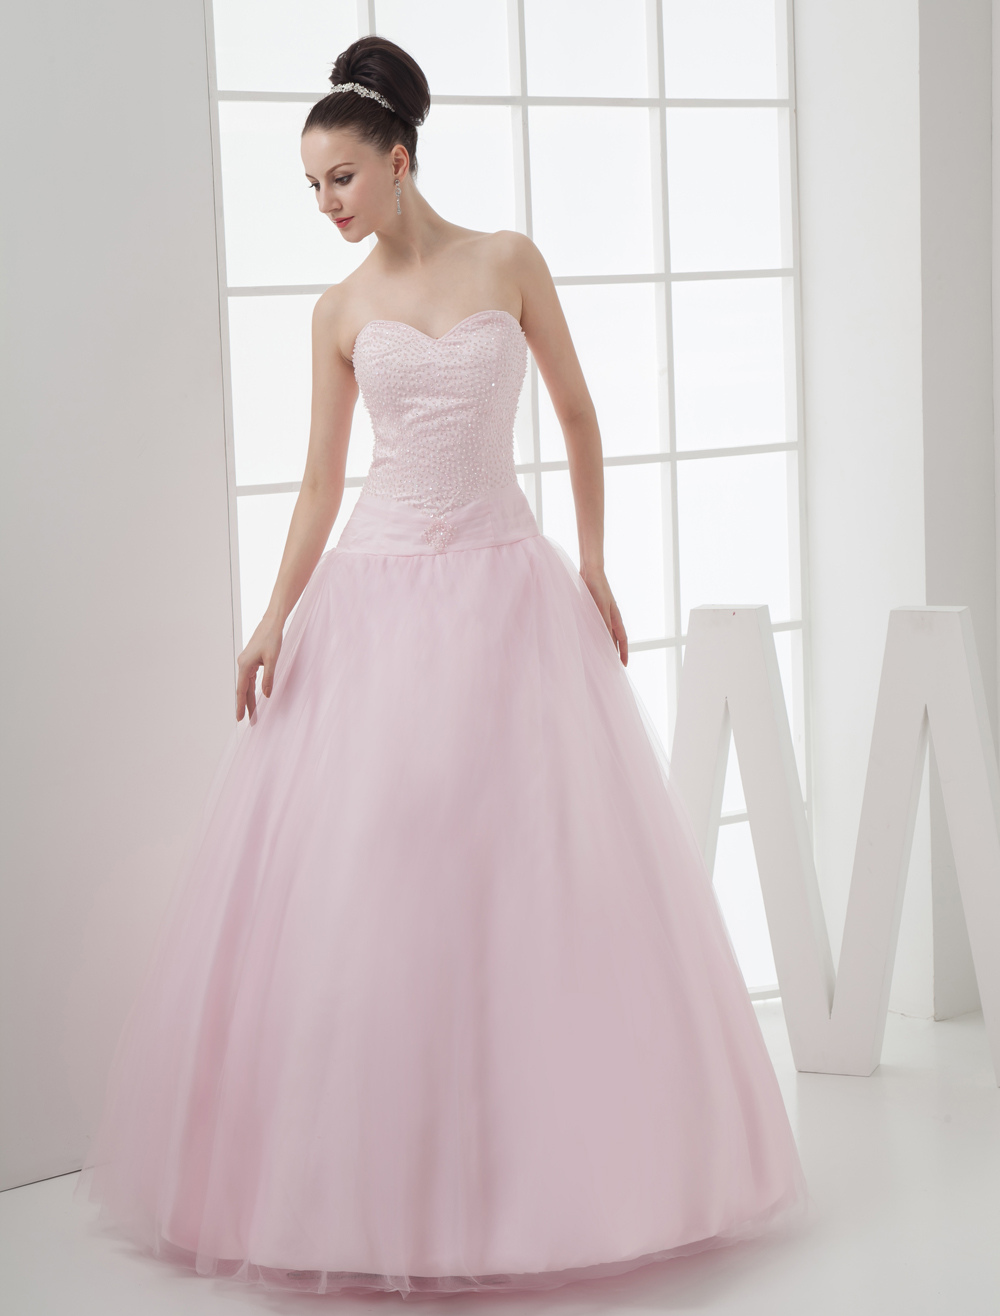 Beautiful Pink Grenadine Strapless Sweetheart Floor Length Prom Dress